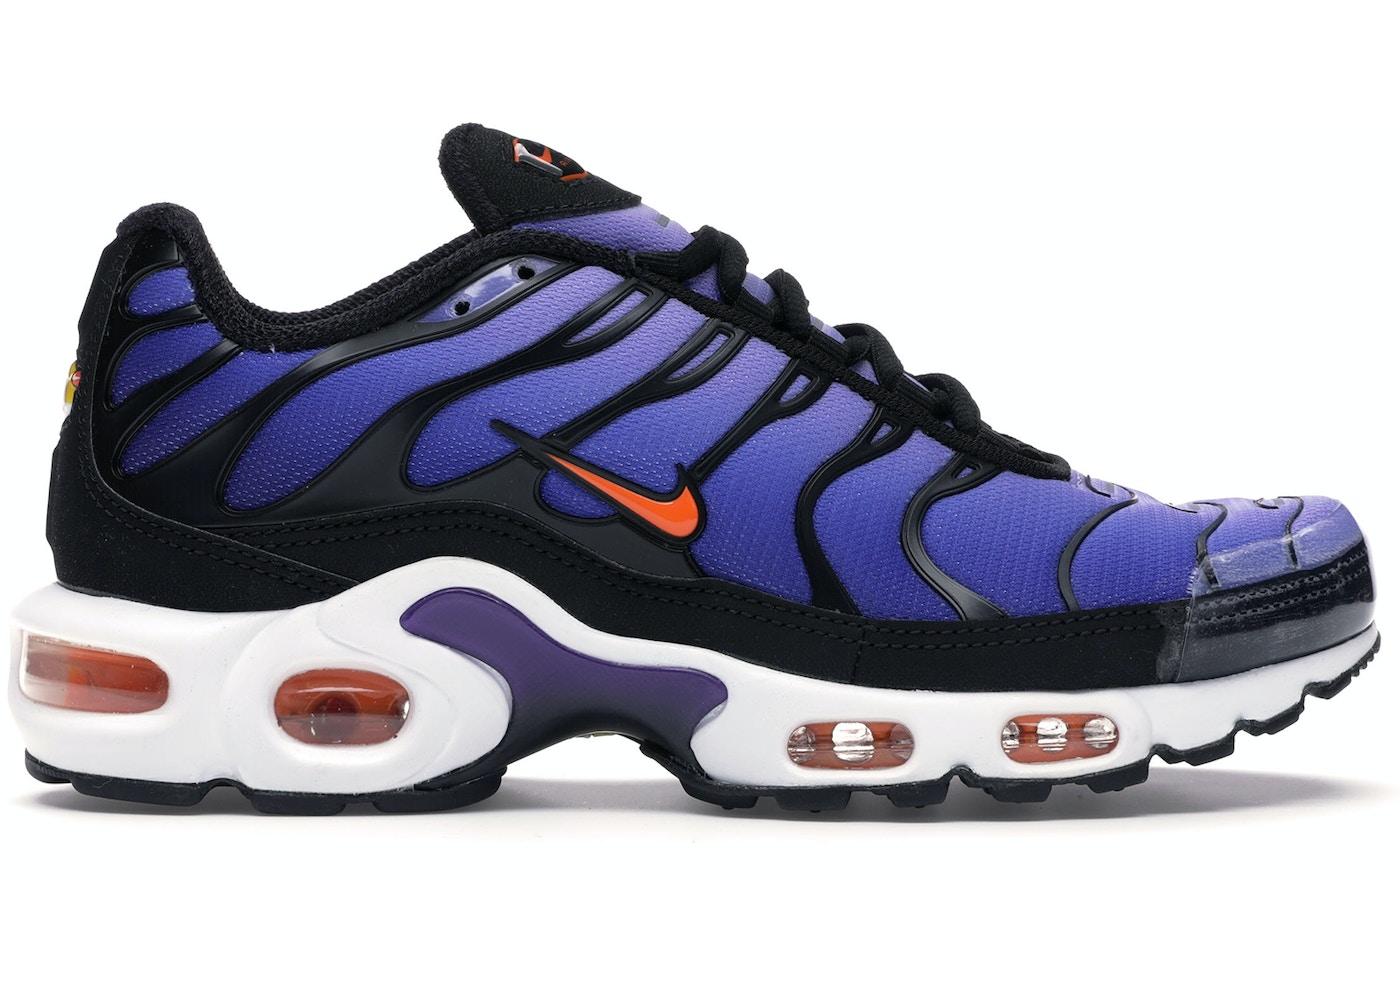 chic clásico selección asombrosa fina artesanía Nike Air Max Plus OG Voltage Purple - BQ4629-002